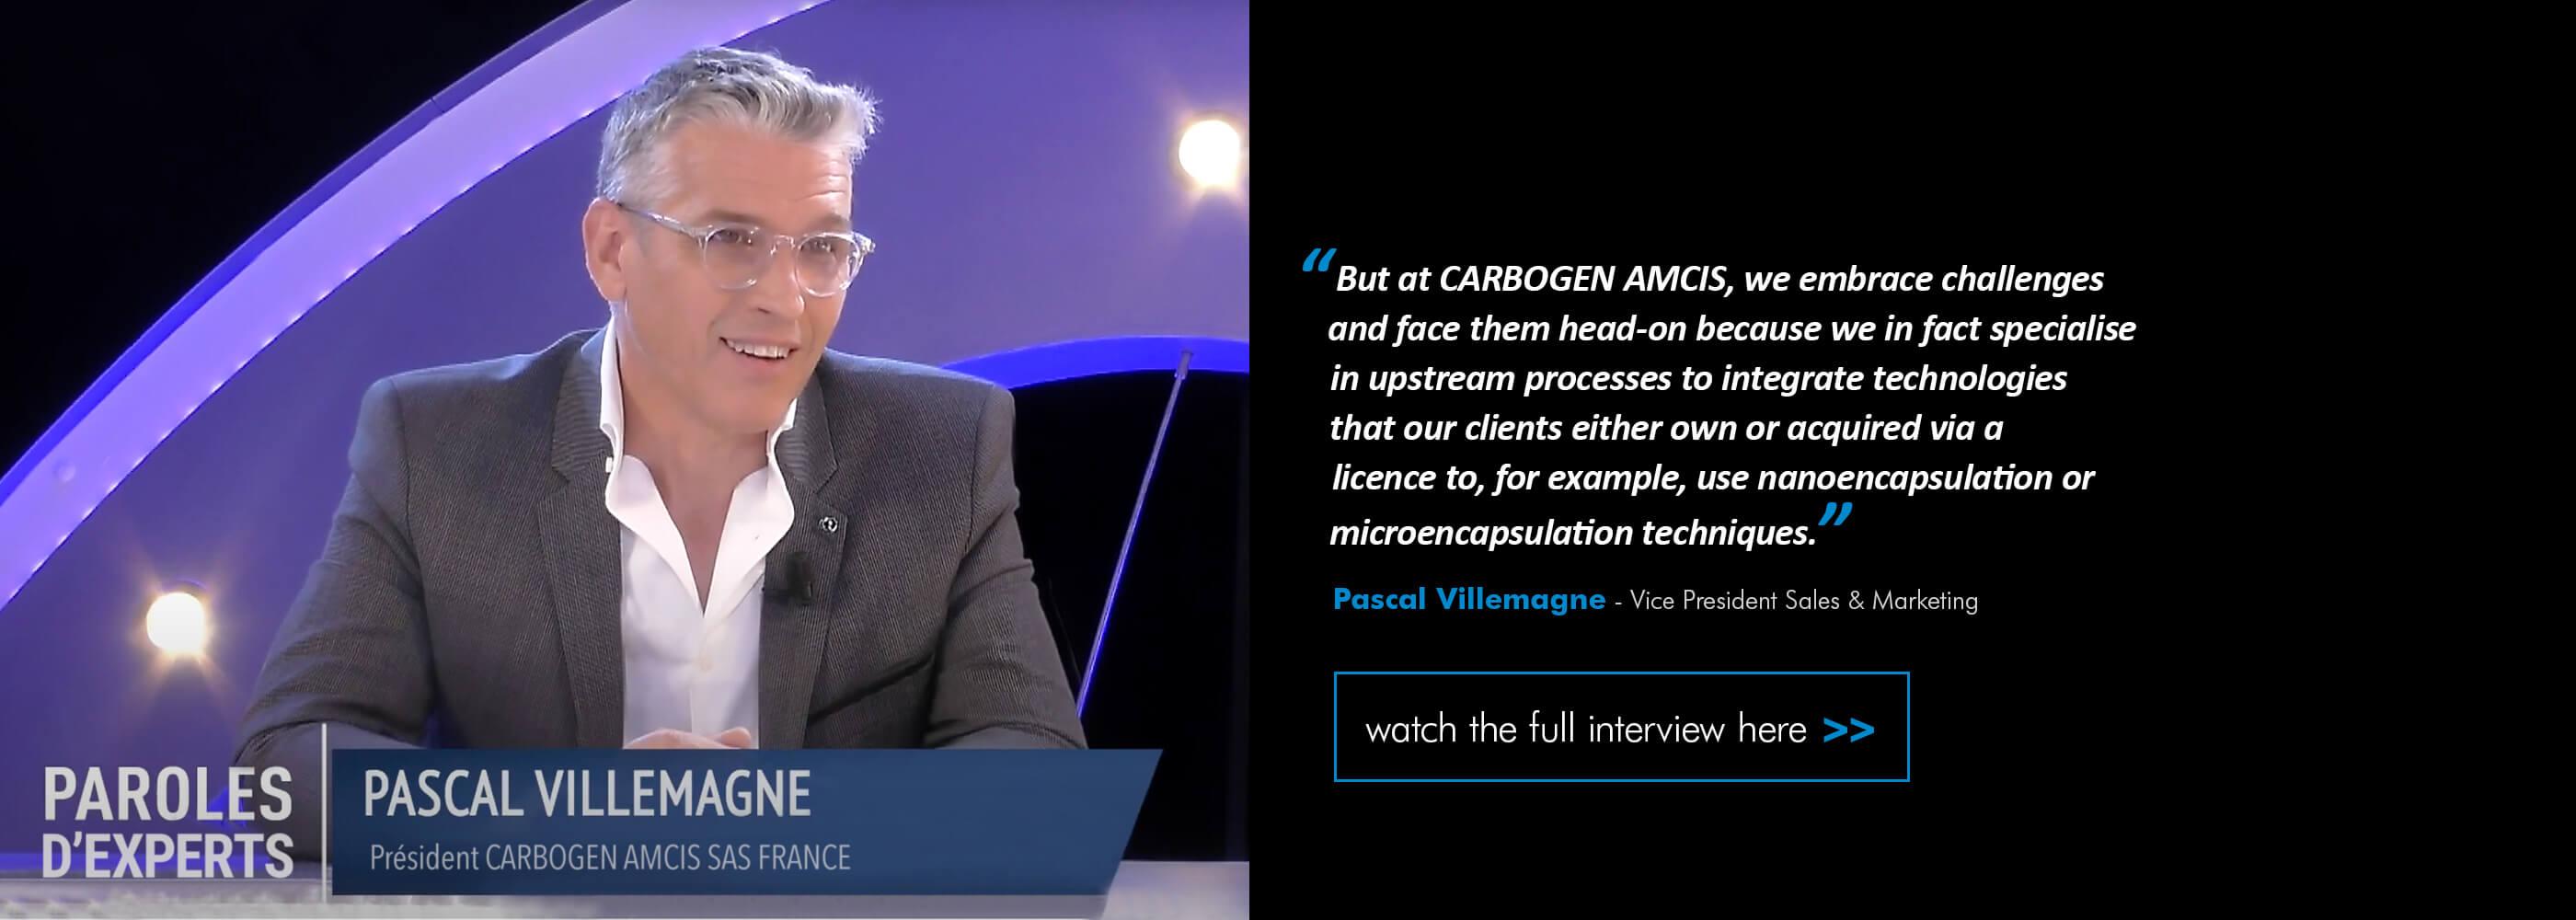 CARBOGEN_AMCIS_PVillemagne_Interview2